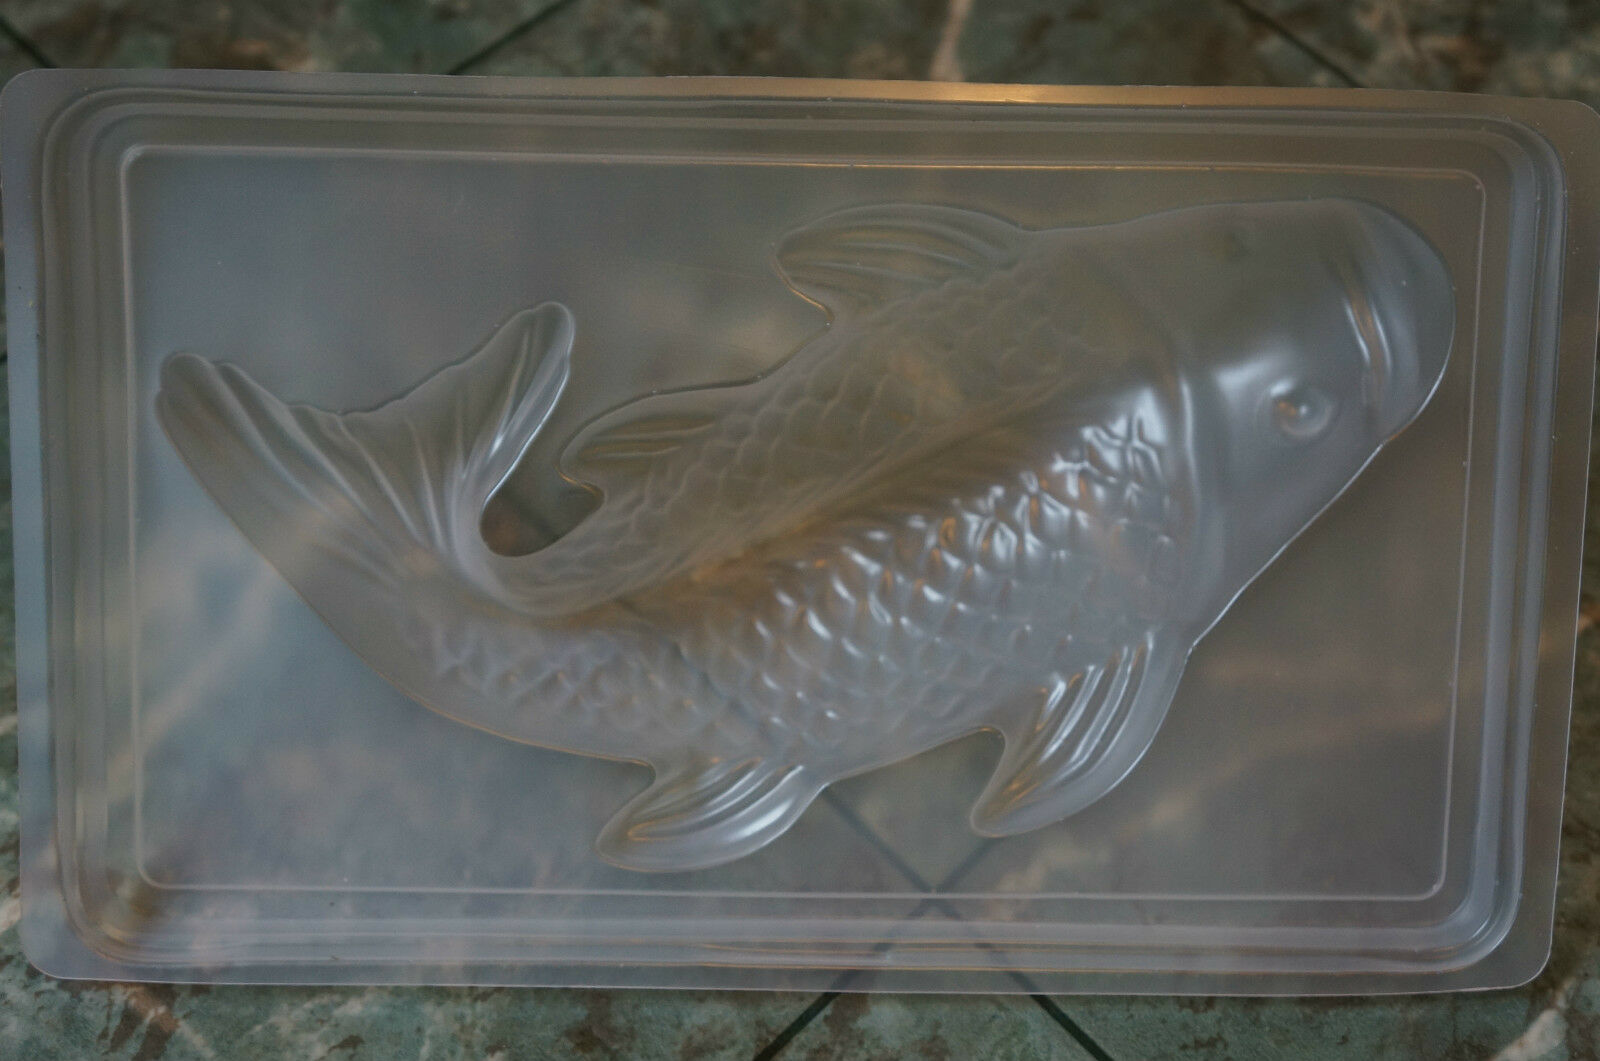 Fish koi chocolate jello steam pudding plastic mold lg for Plastic koi fish